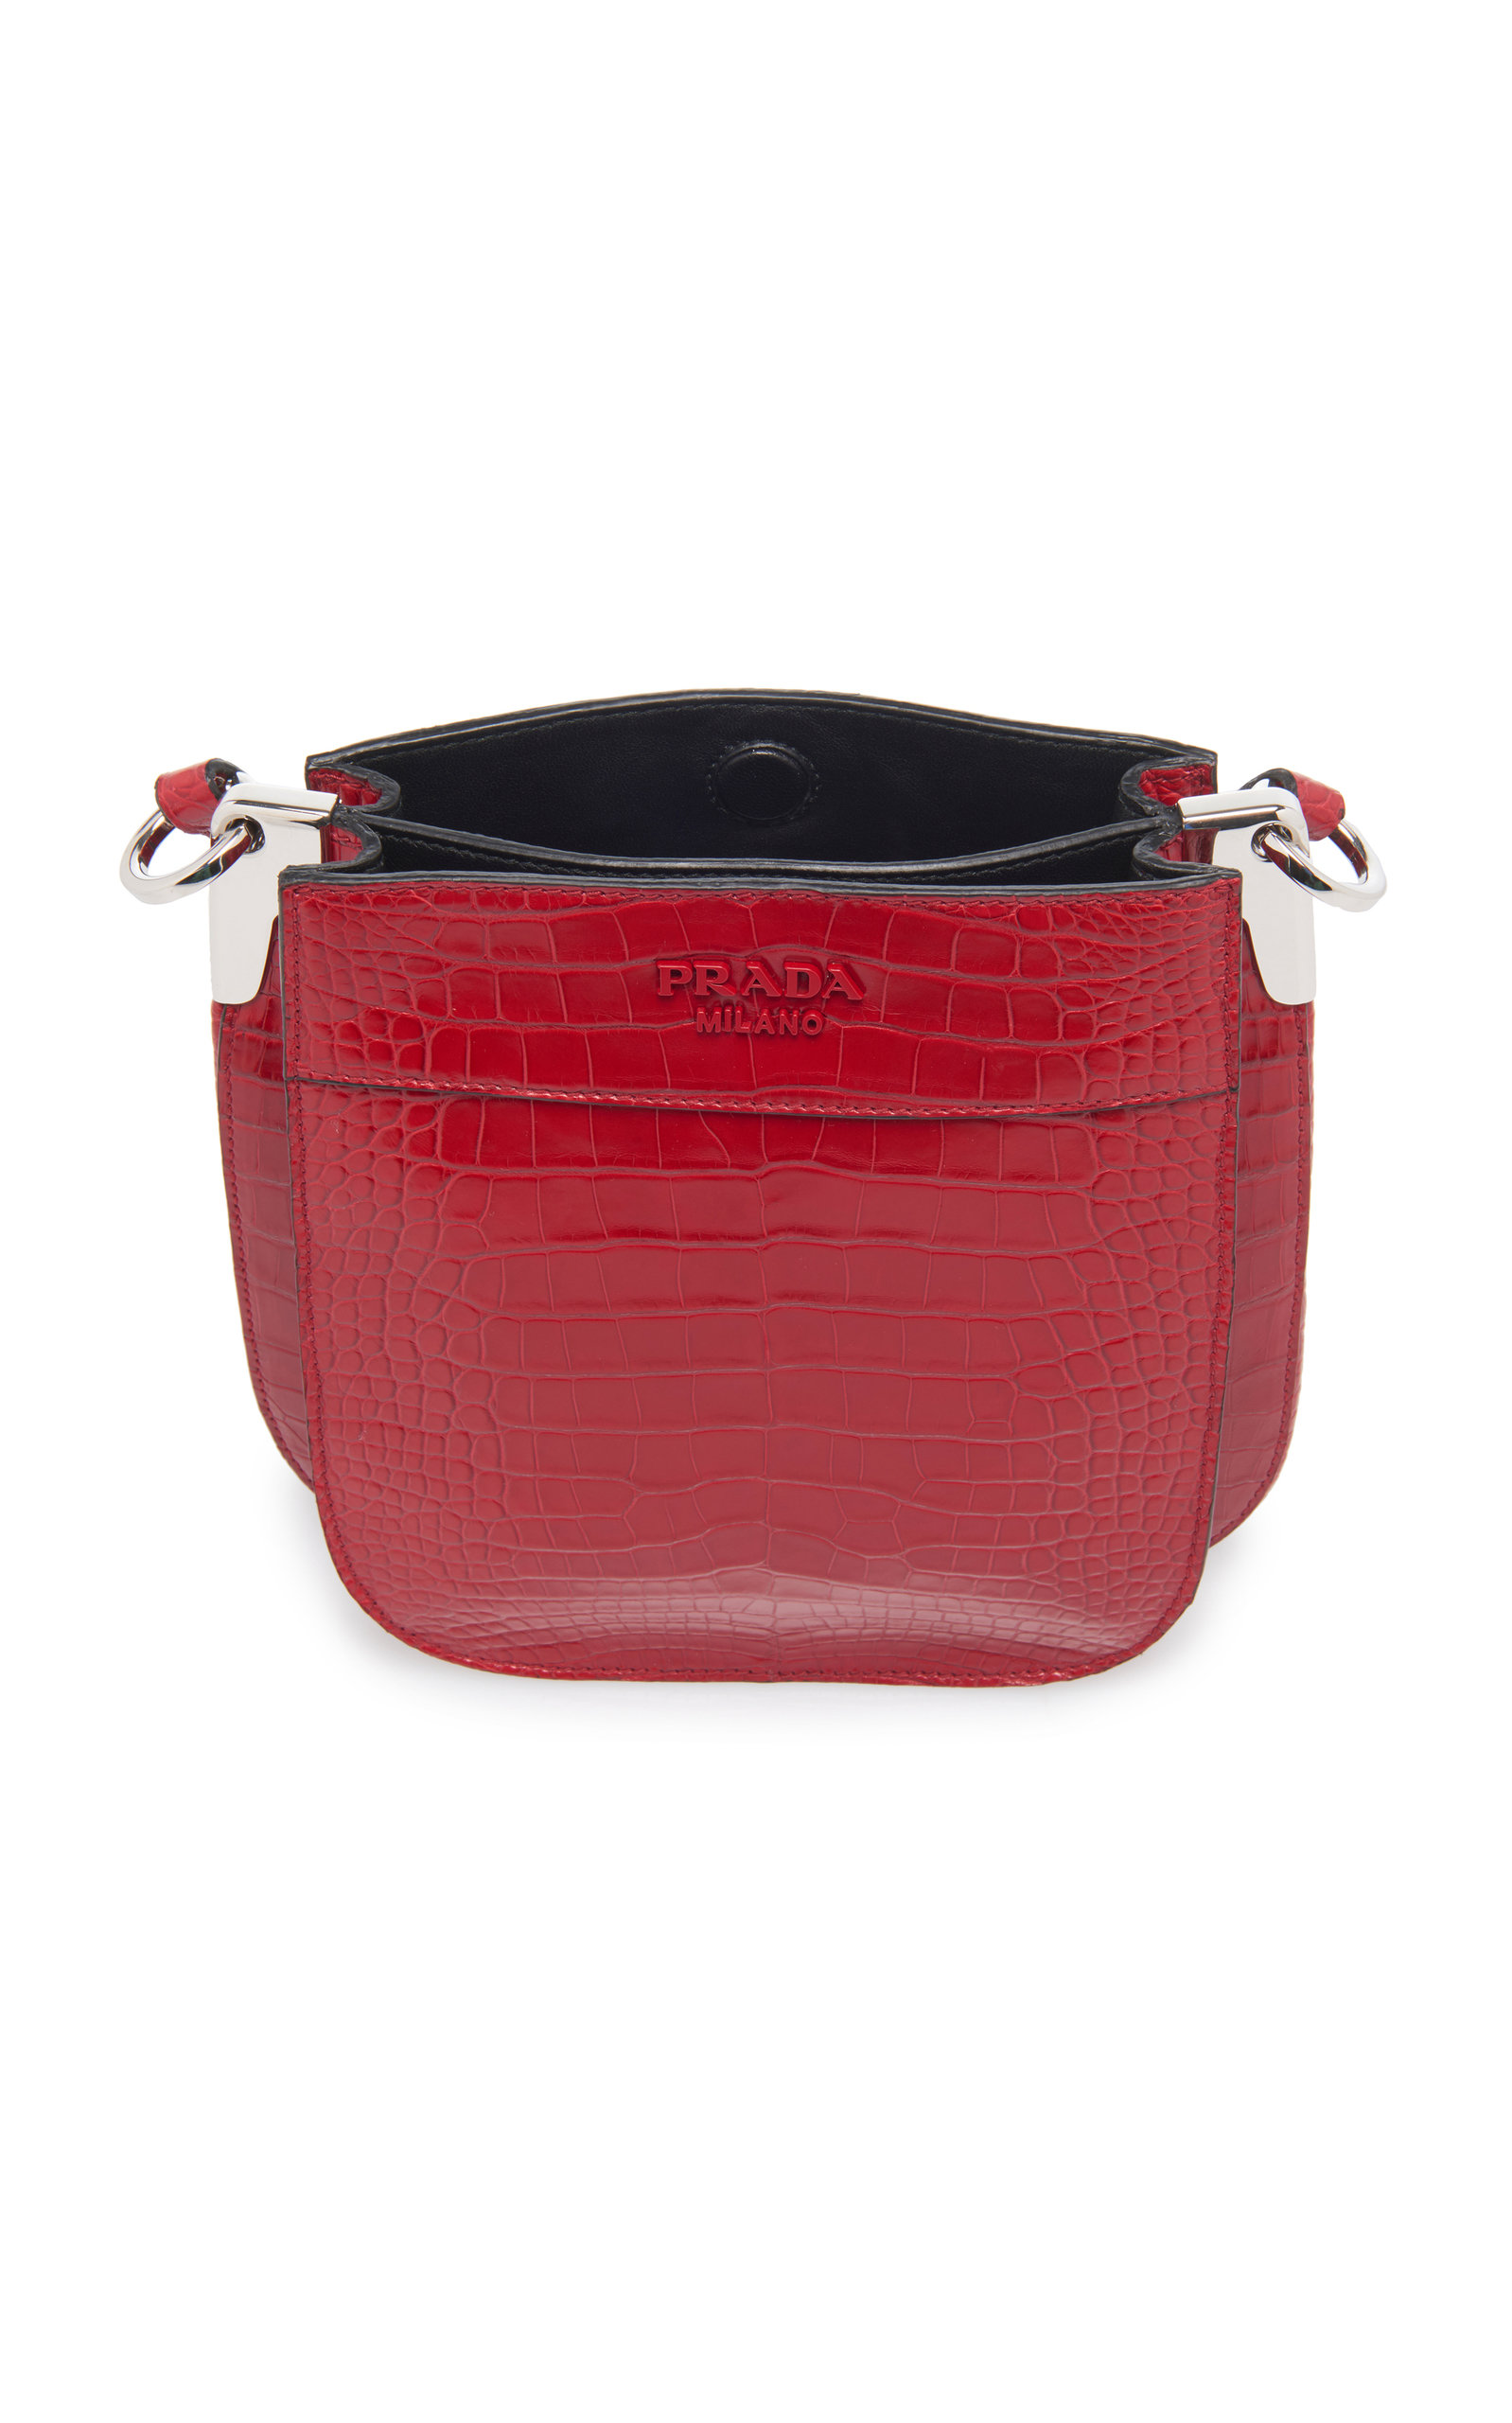 fc2122898442e8 Pradacrocodile Bucket Bag Close Loading. Crocodile Bucket Bag By Prada Moda  Operandi